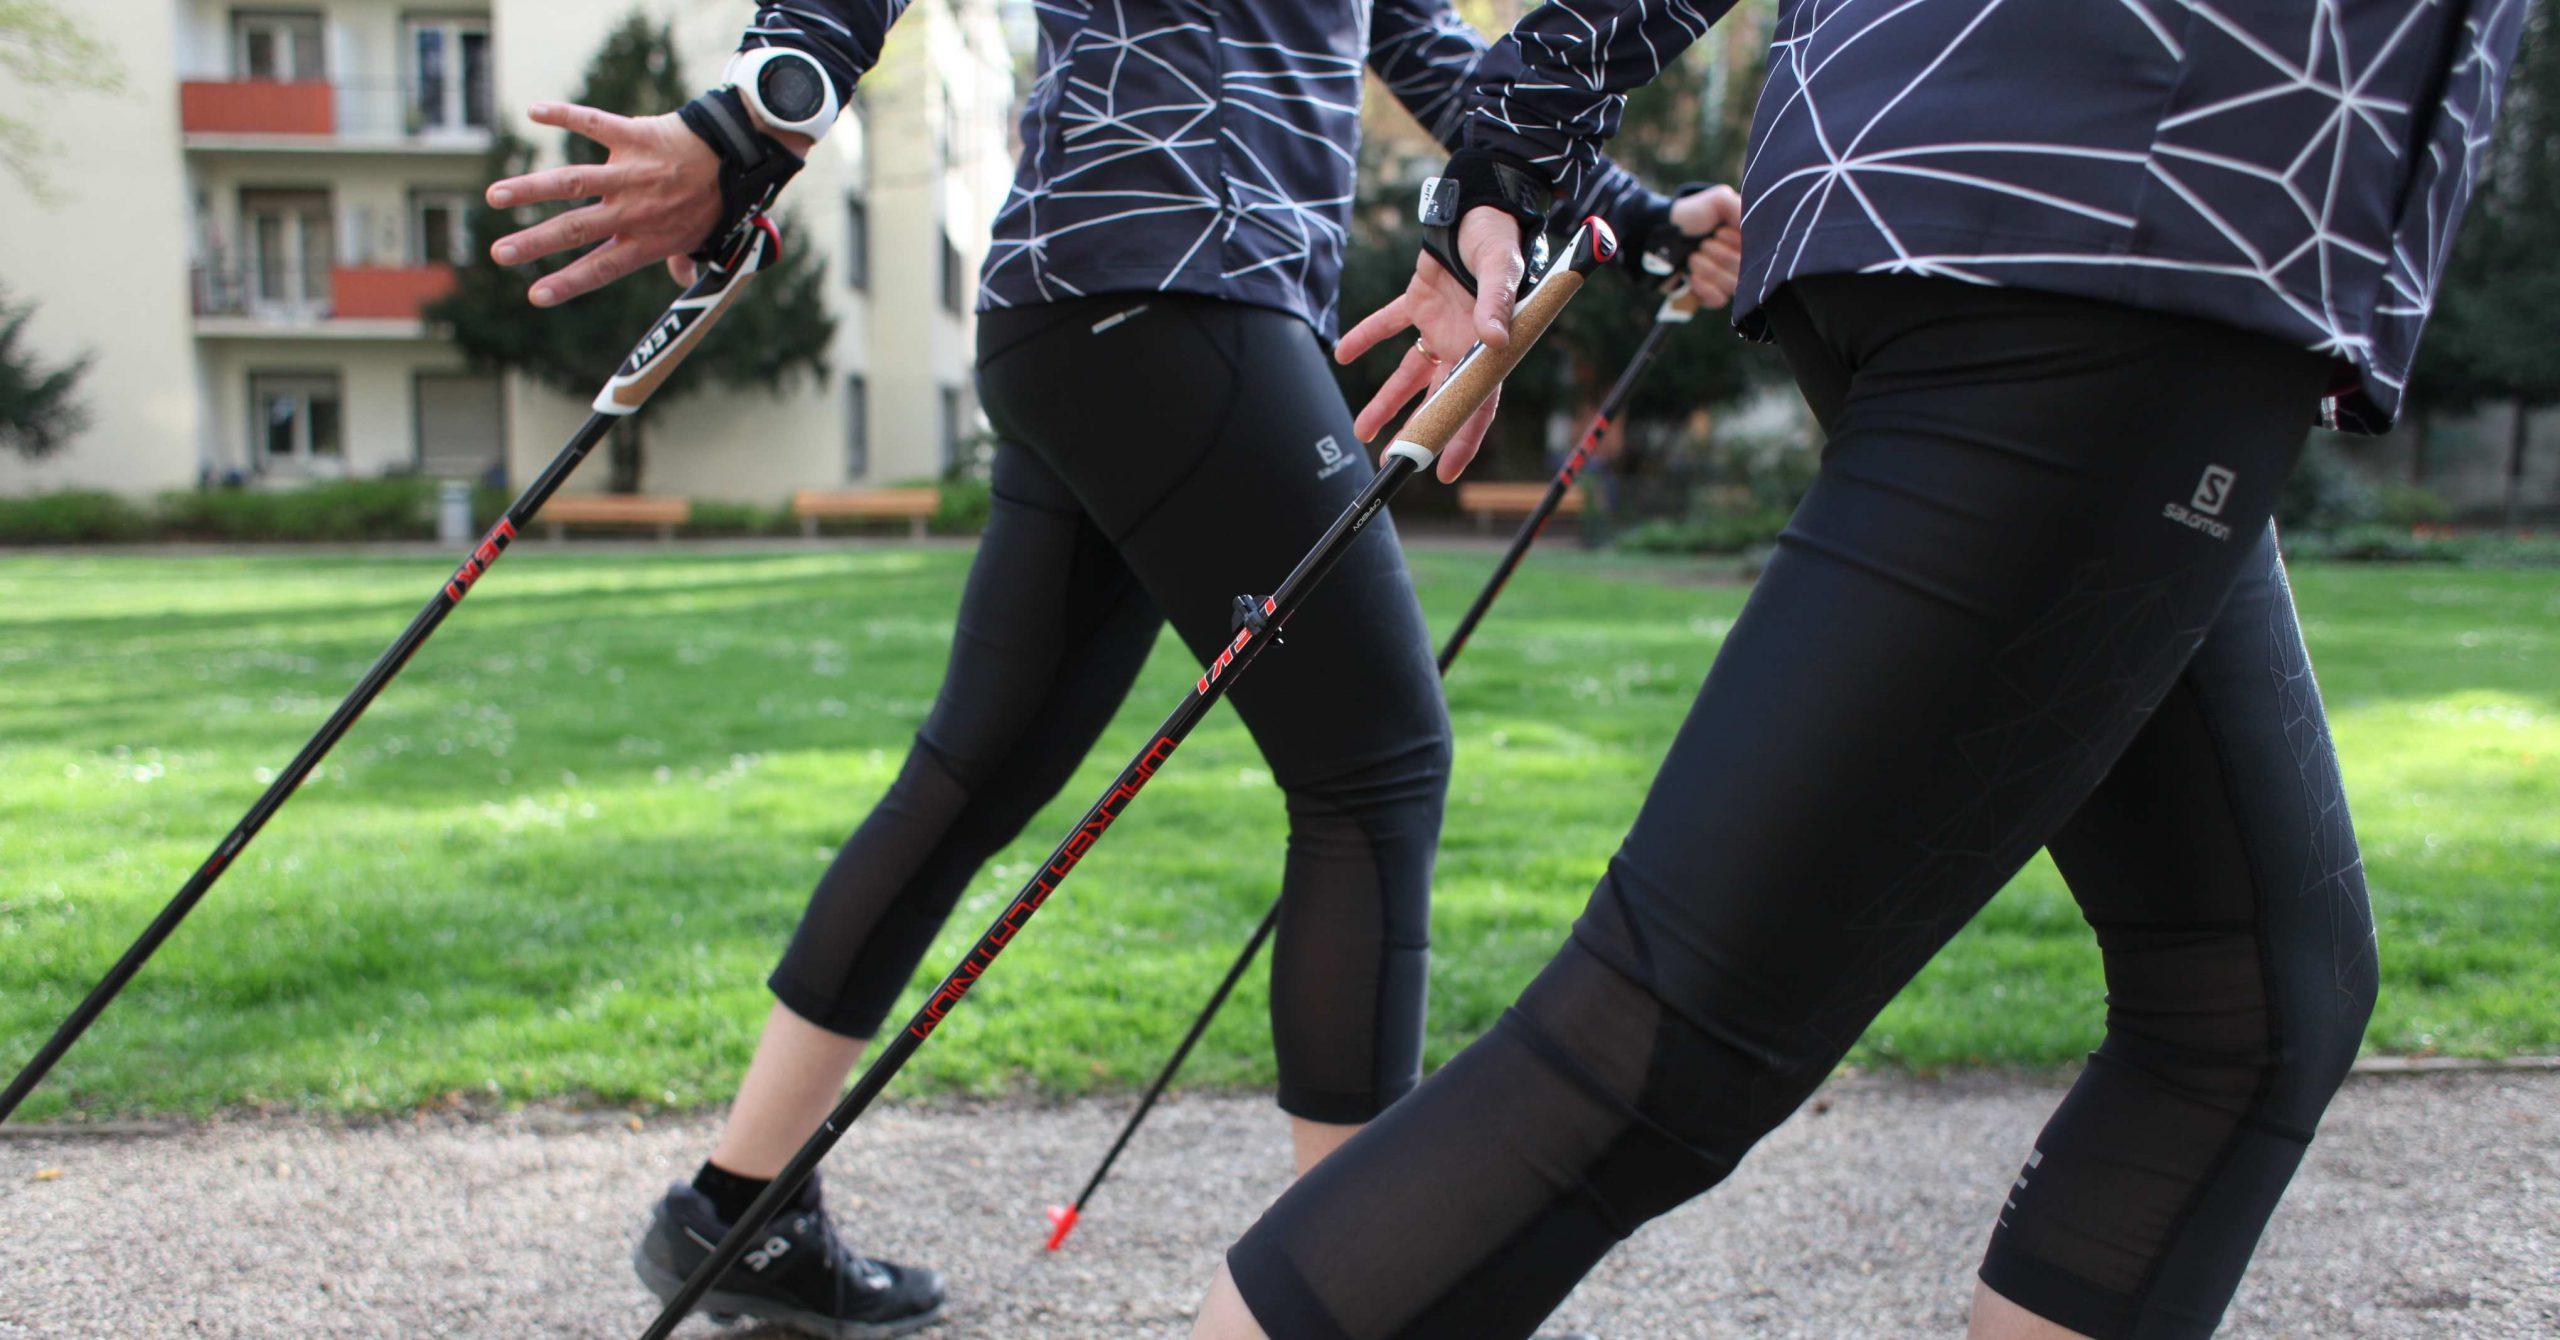 Neu bei engelhorn – Nordic Walking Gruppe für Anfänger